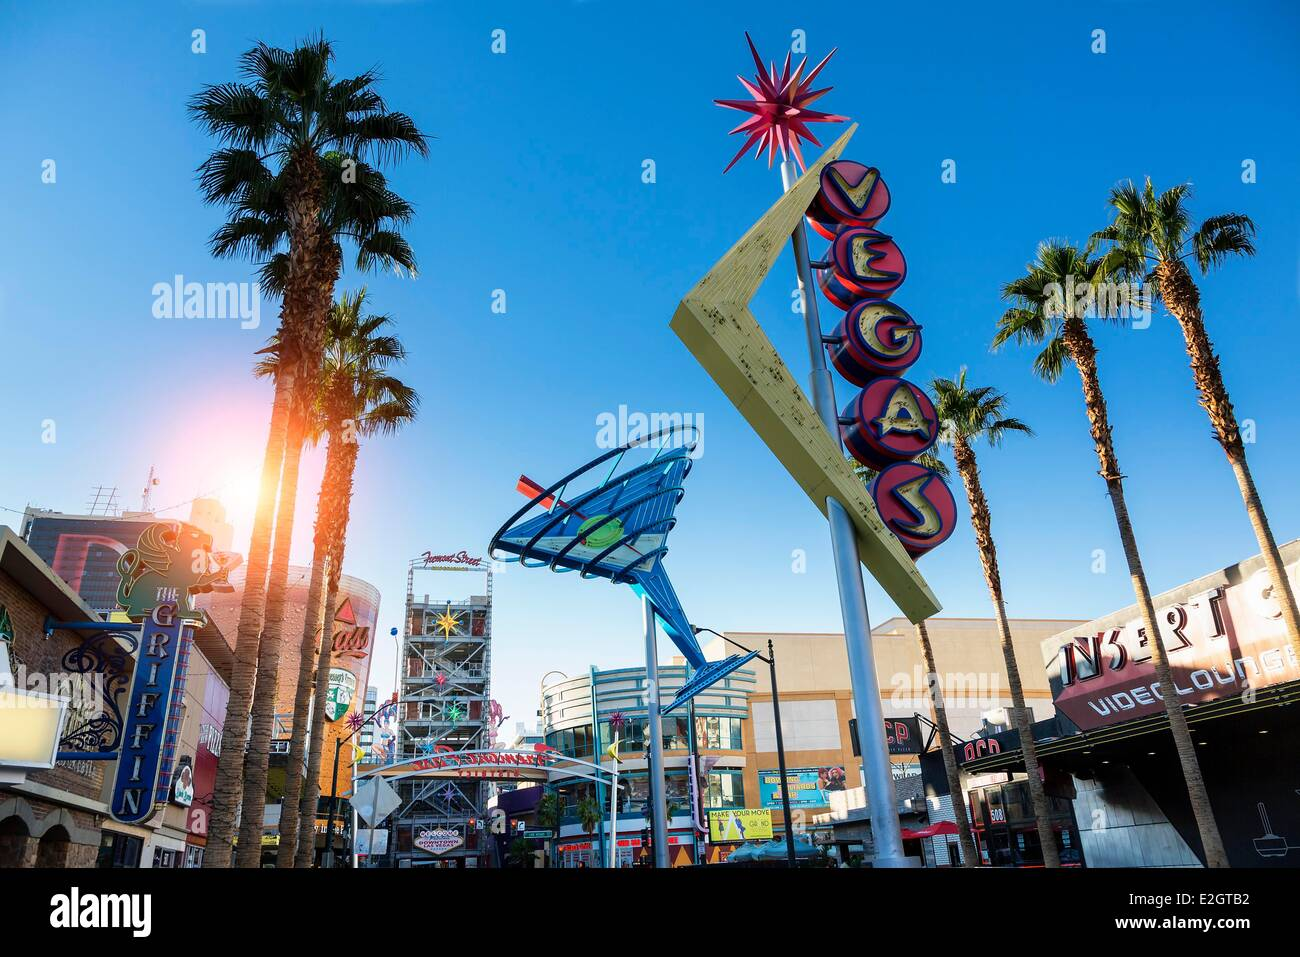 Las Vegas Fremont Street Stock Photos & Las Vegas Fremont Street ...